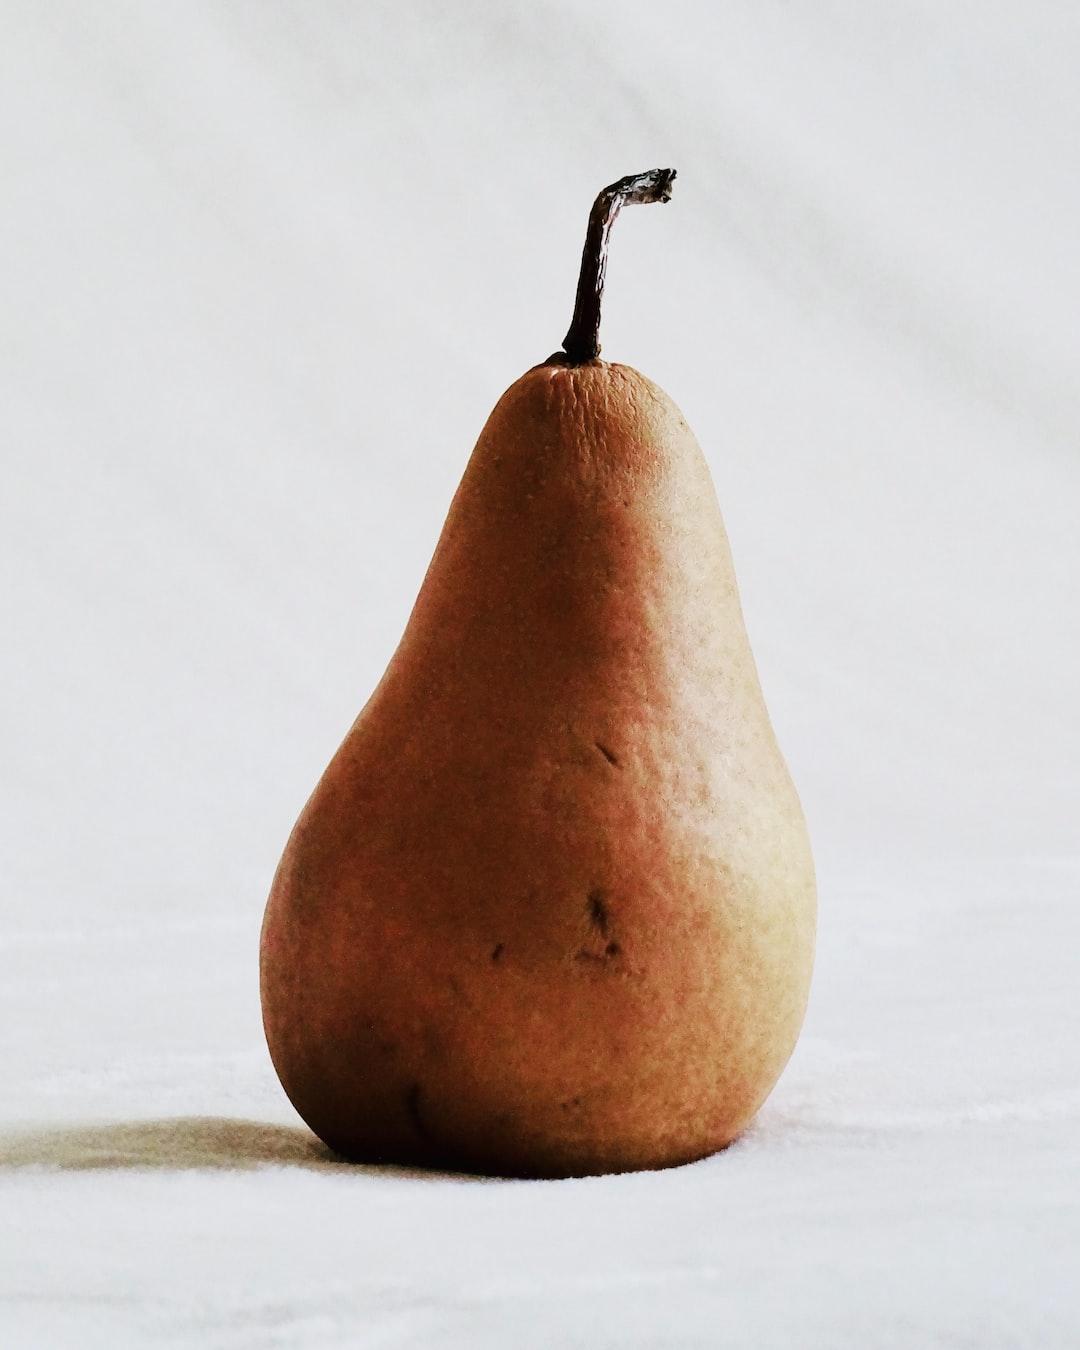 Bosc pear.